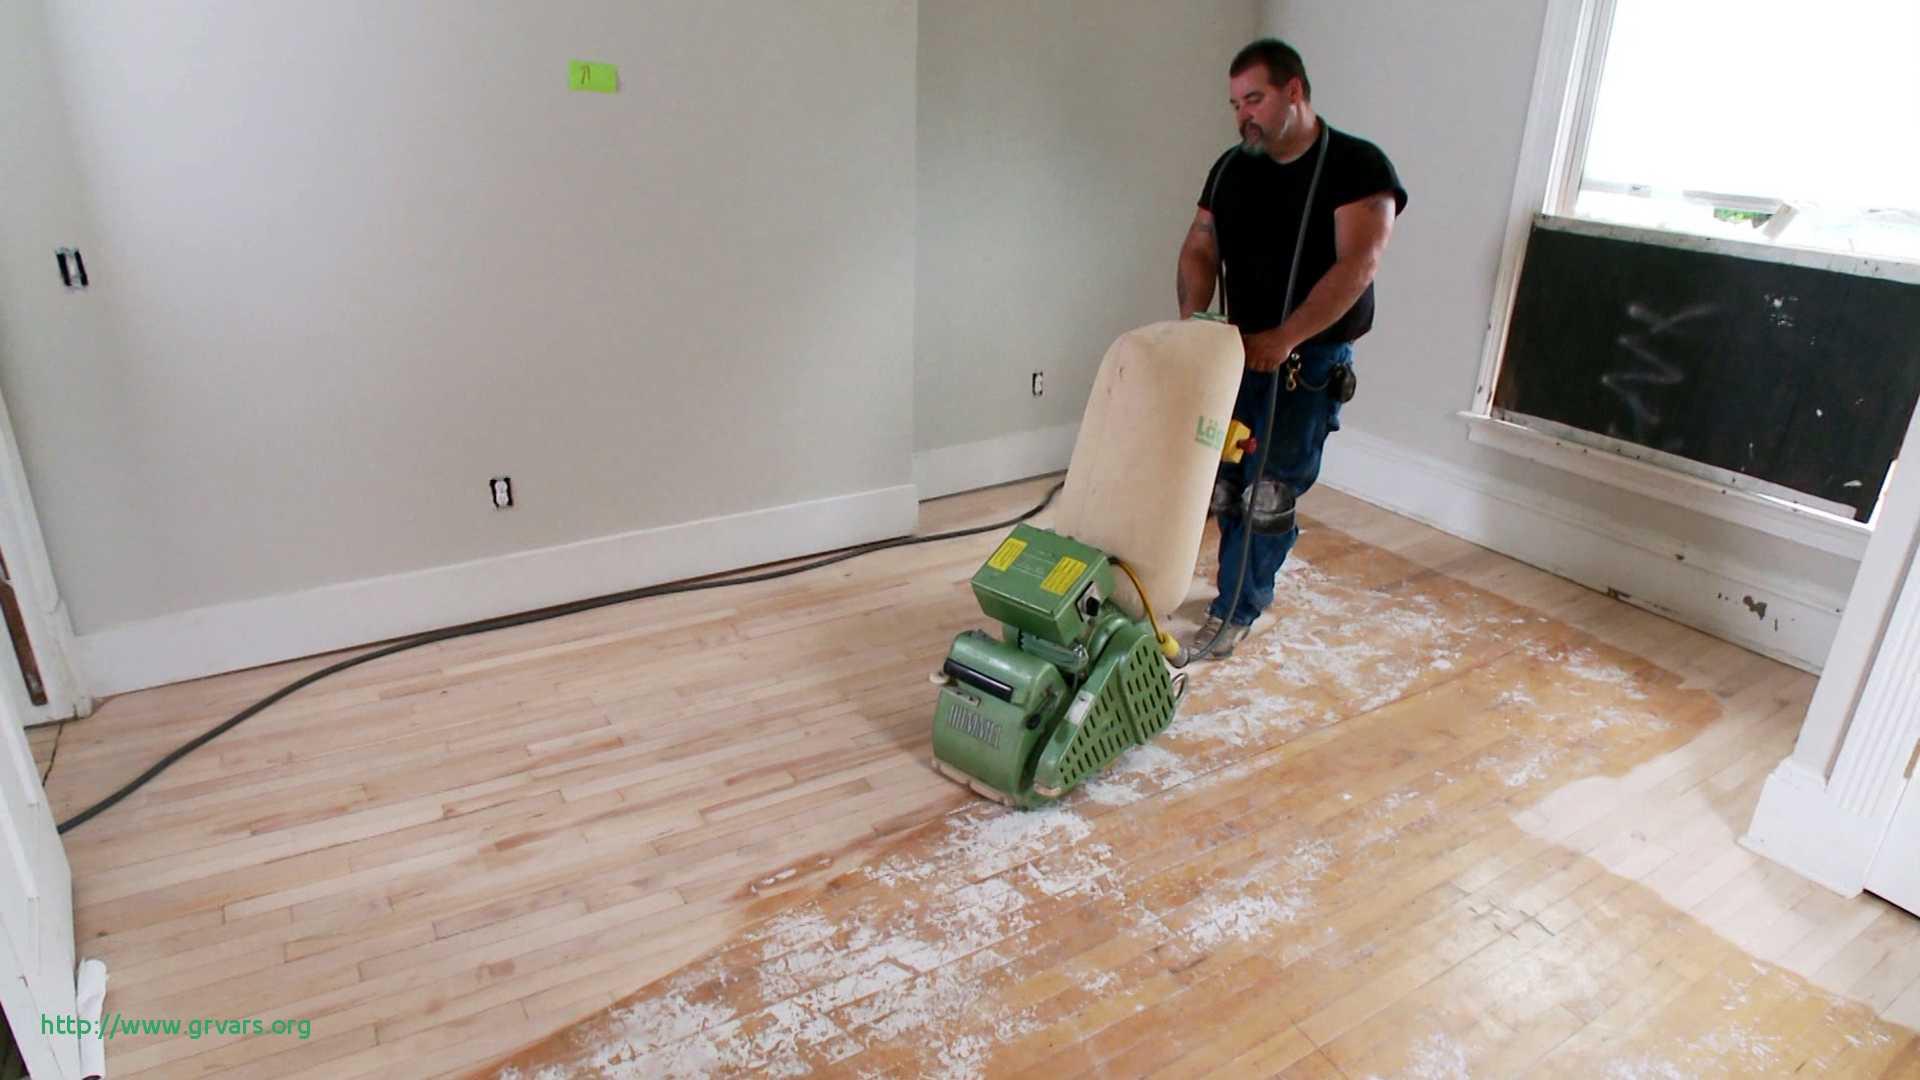 staining hardwood floors after sanding of elegant hardwood floors pet stains home inspiration interior pertaining to sanding elegant hardwood floors pet stains